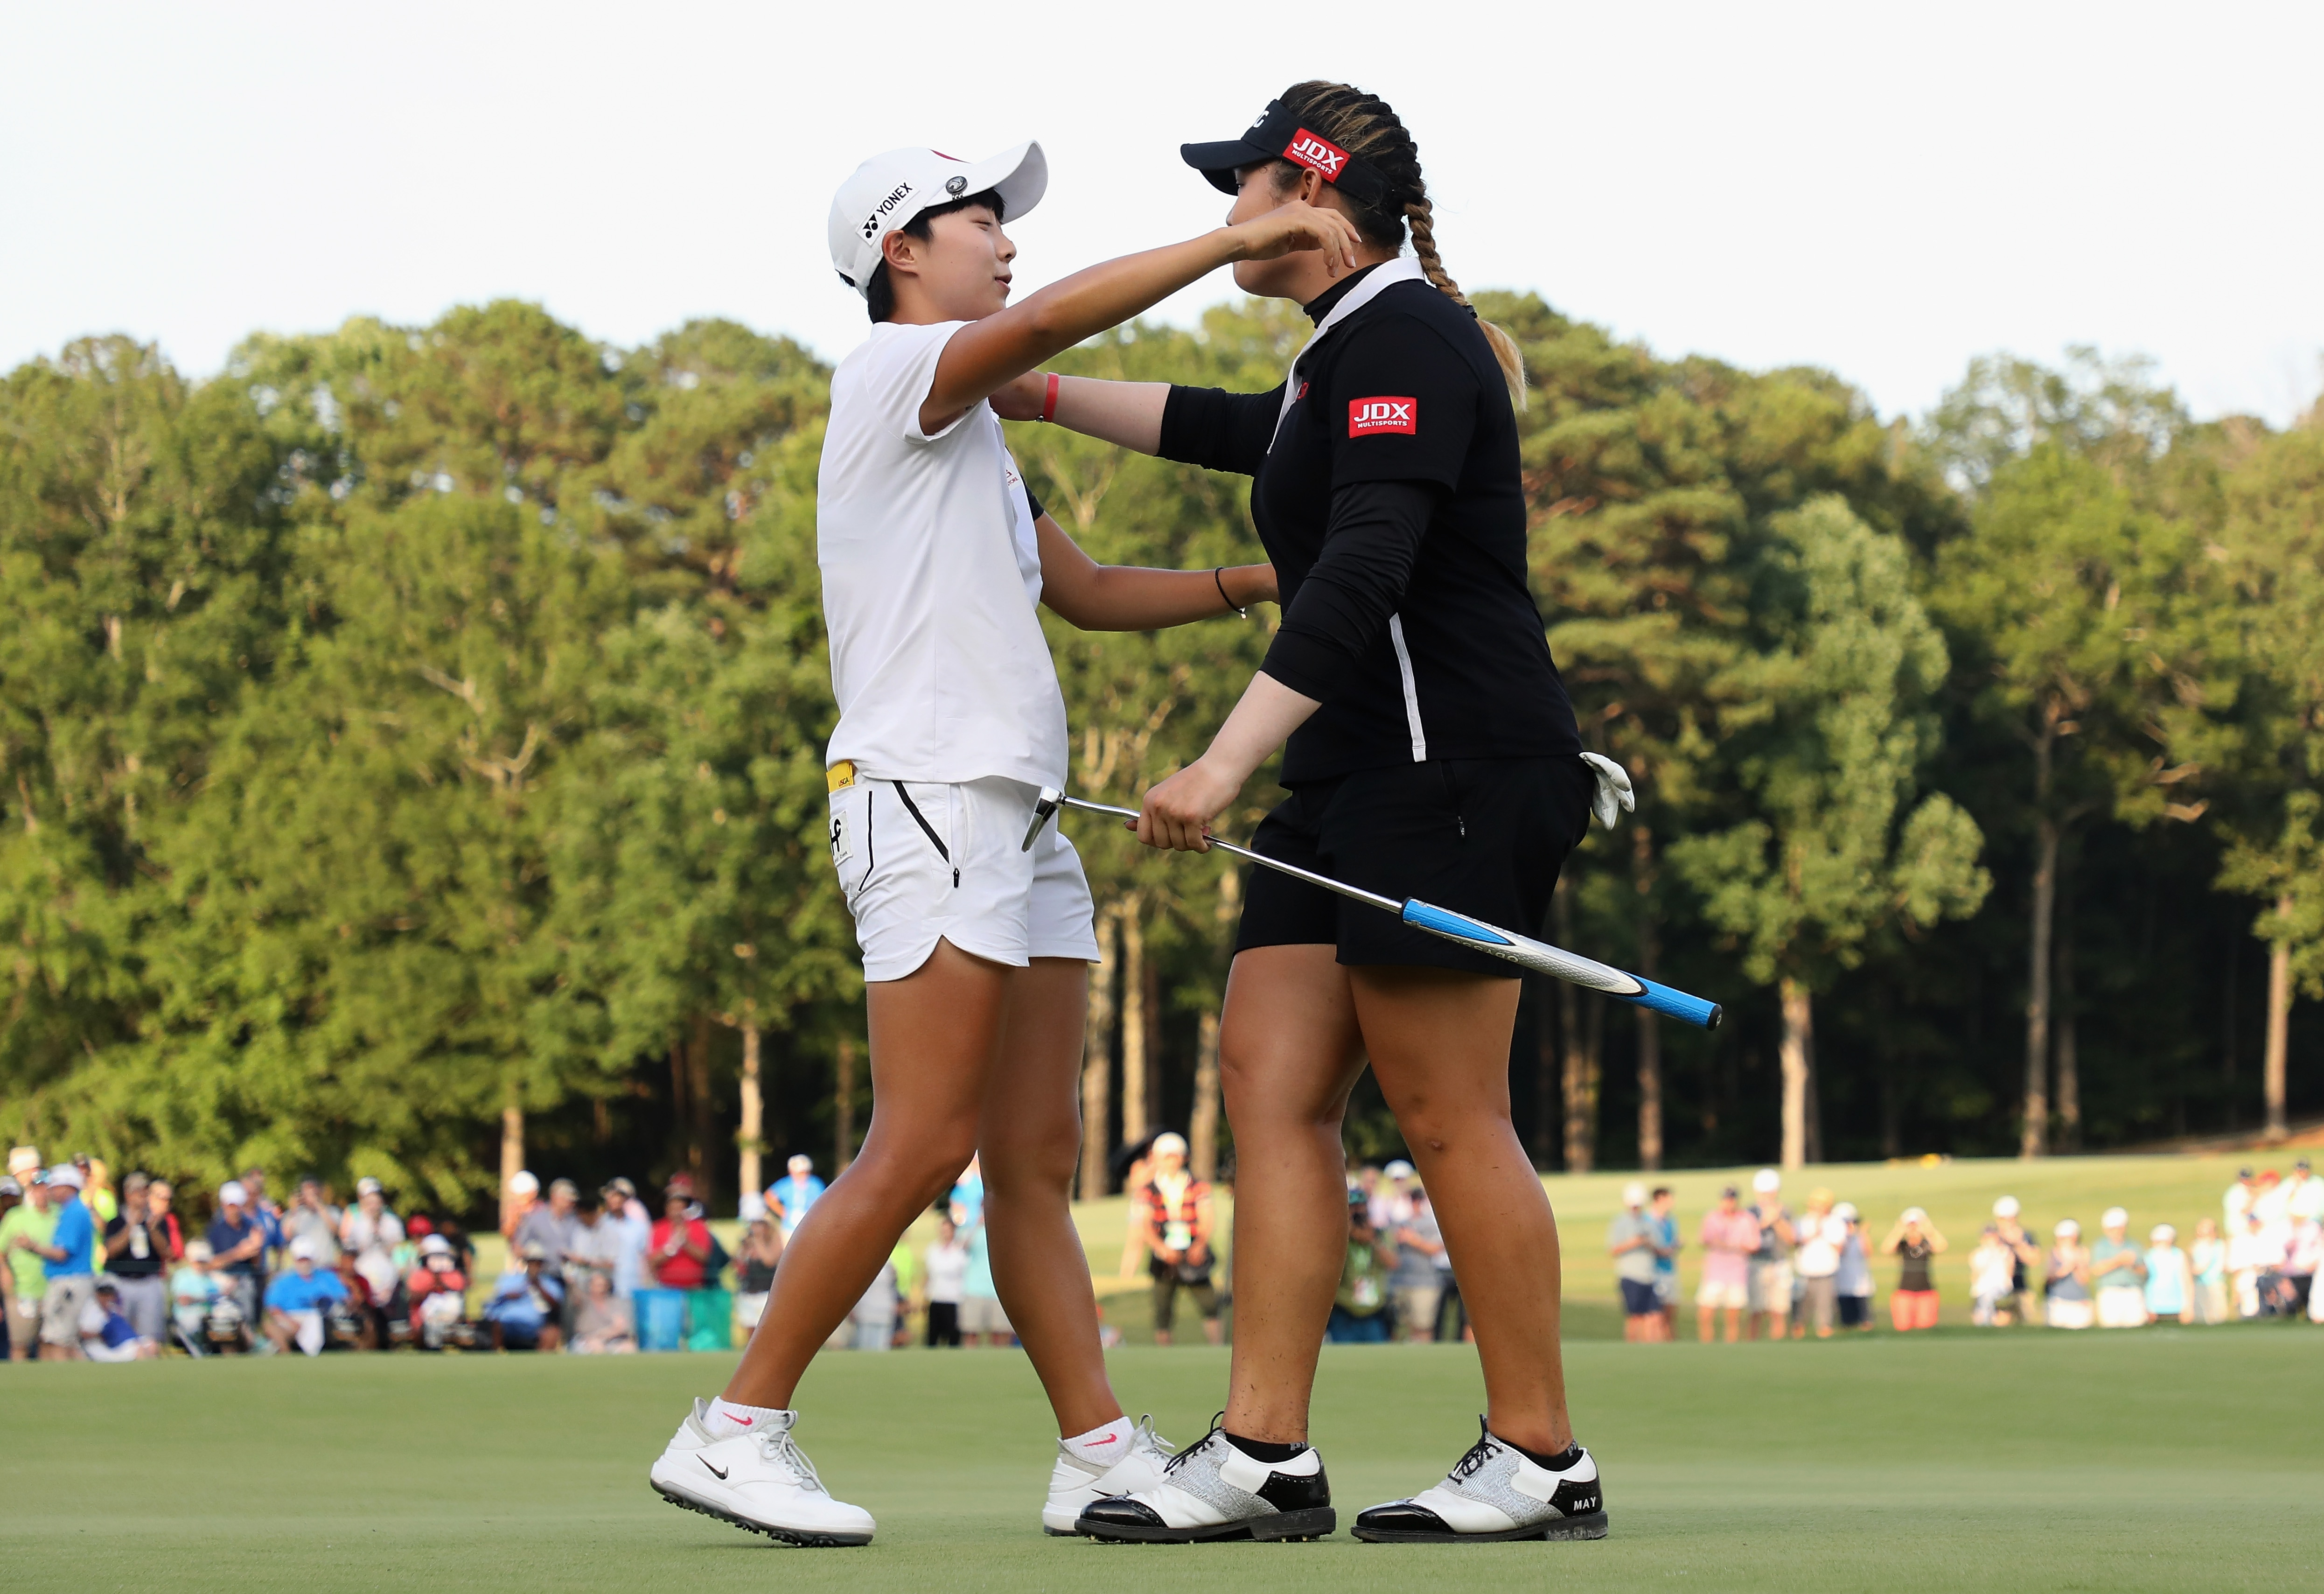 Hyo-Joo Kim and Ariya Jutanugarn at the 2018 U.S. Women's Open